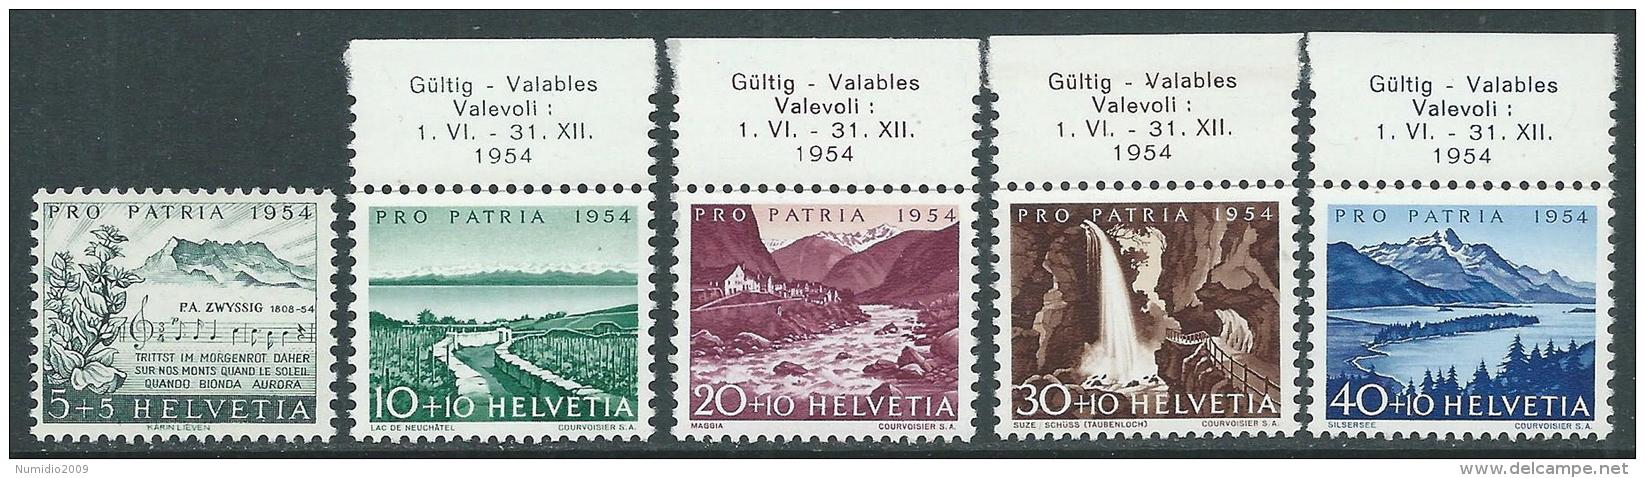 1954 SVIZZERA PRO PATRIA VEDUTE DIVERSE MNH ** - I58 - Pro Patria